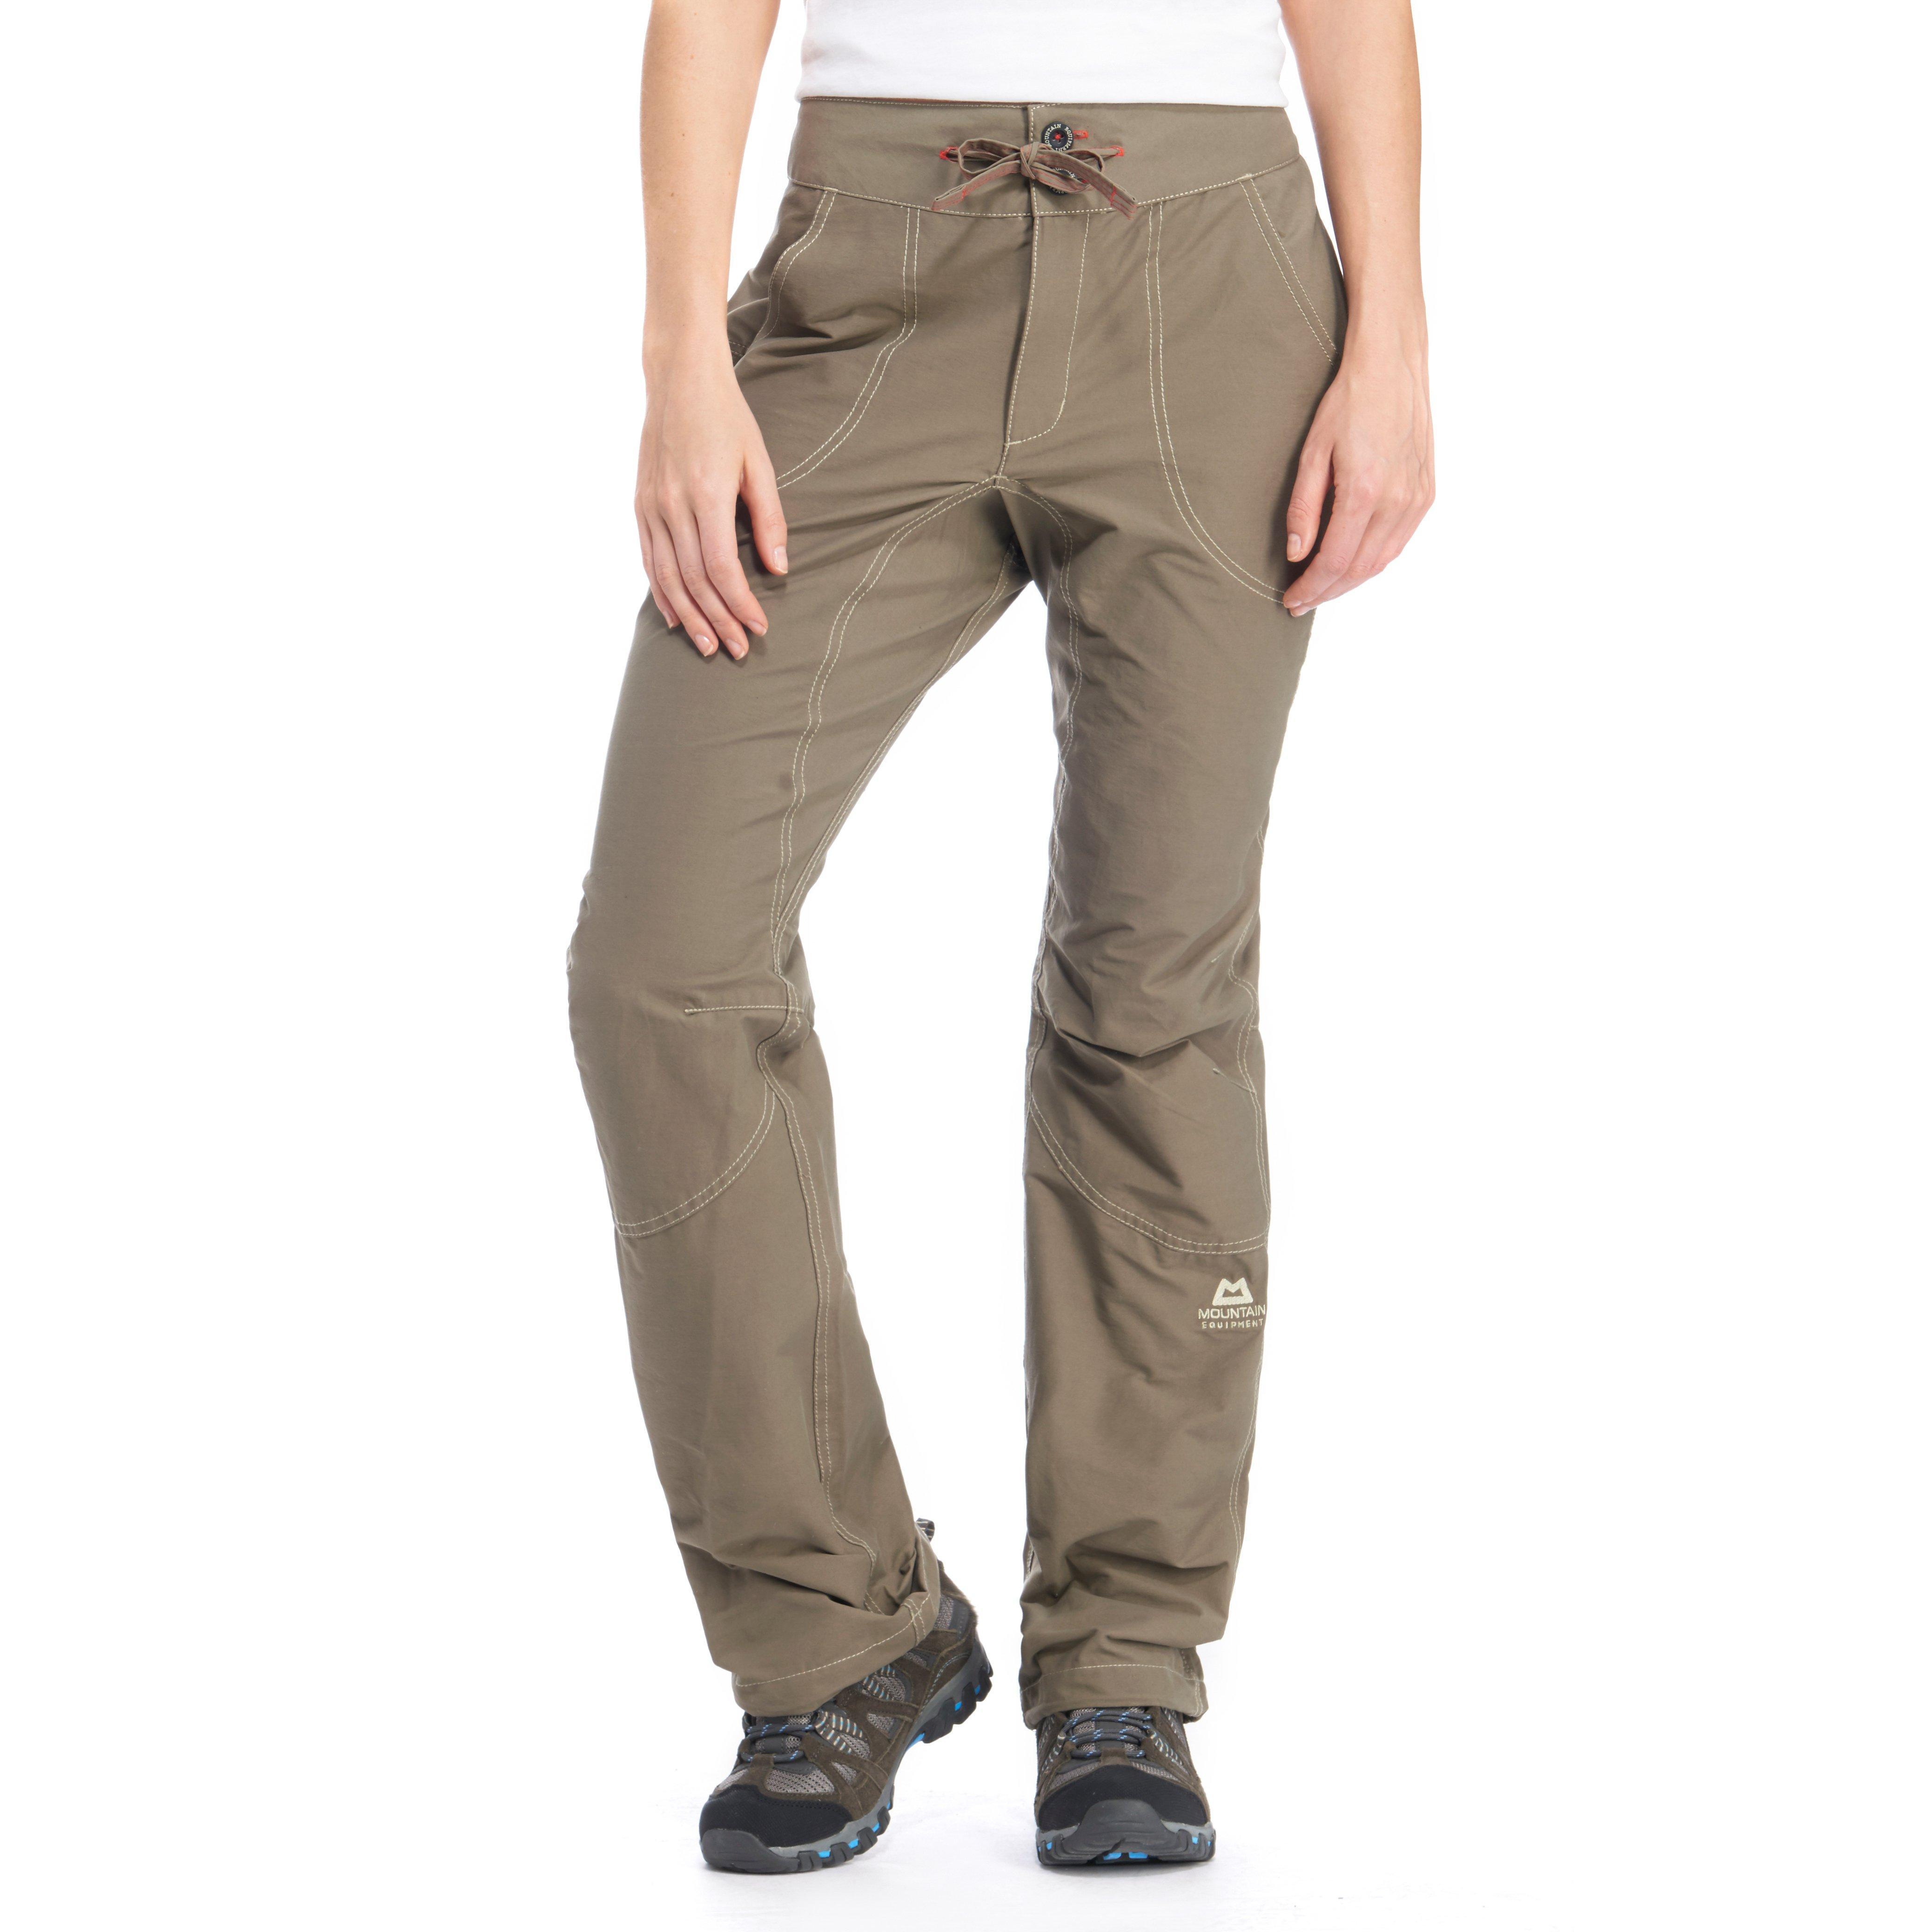 Mountain Equipment Women's Viper Pants, Khaki